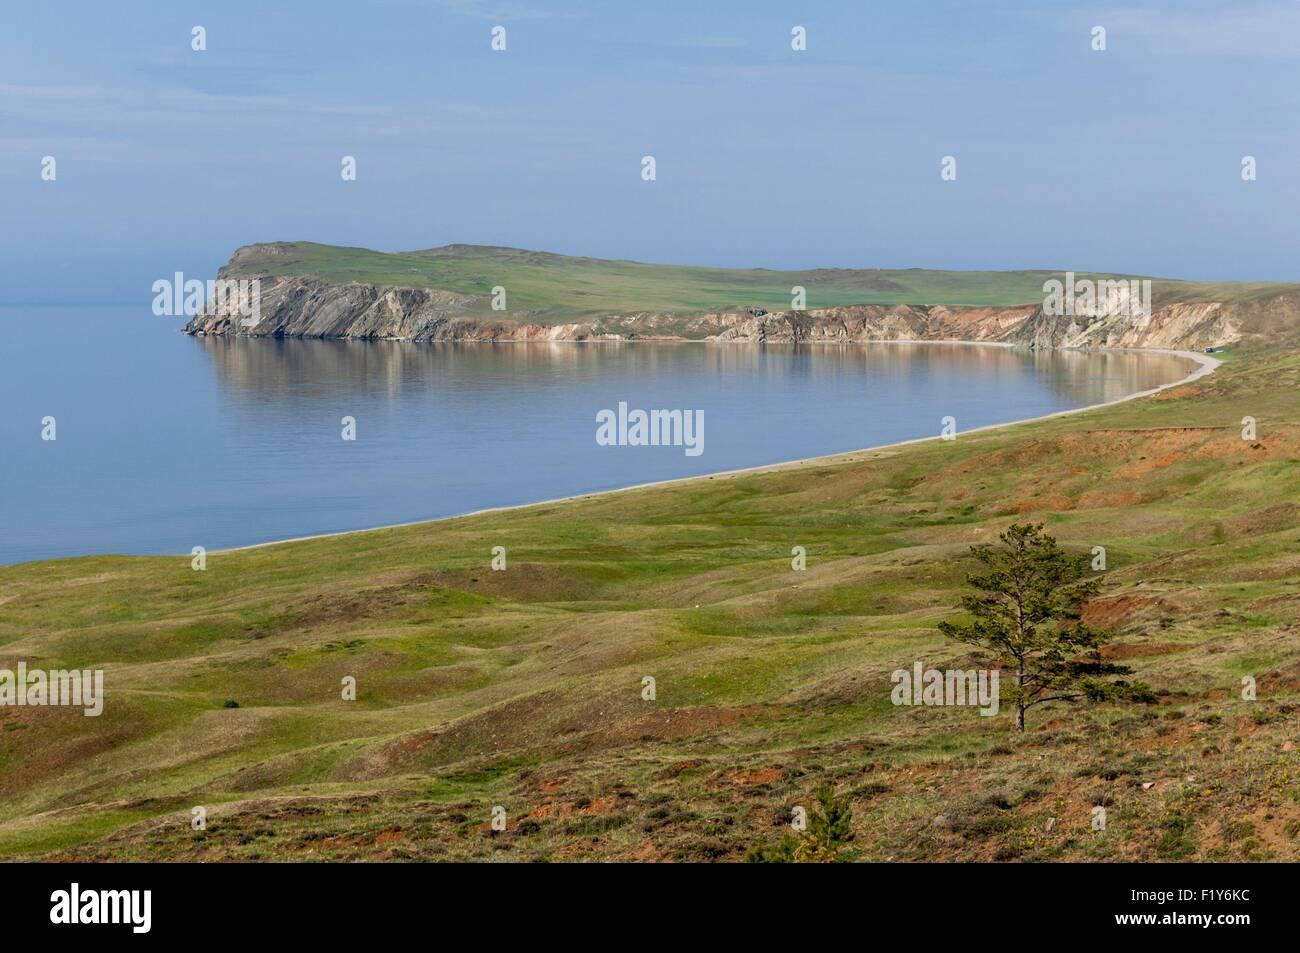 Russia, Siberia, Lake Baikal listed as World Heritage by UNESCO, Olkhon Island, Peschanaya Bay - Stock Image